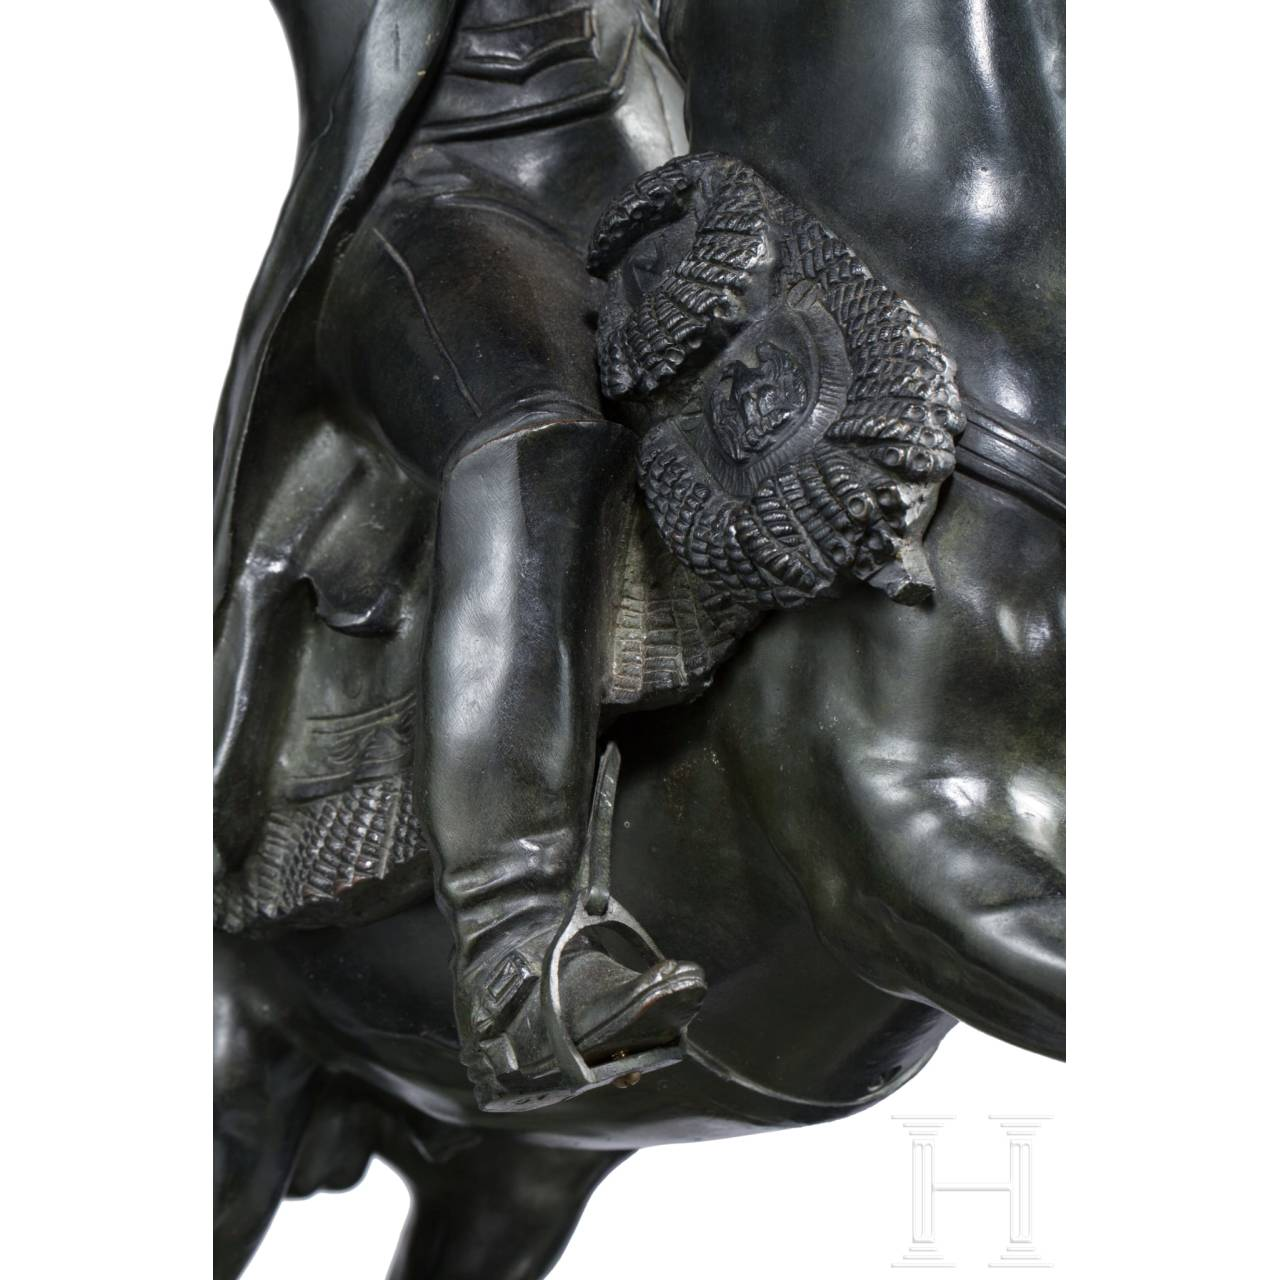 A monumental bronze figure of Emperor Napoleon I on a rampant horse